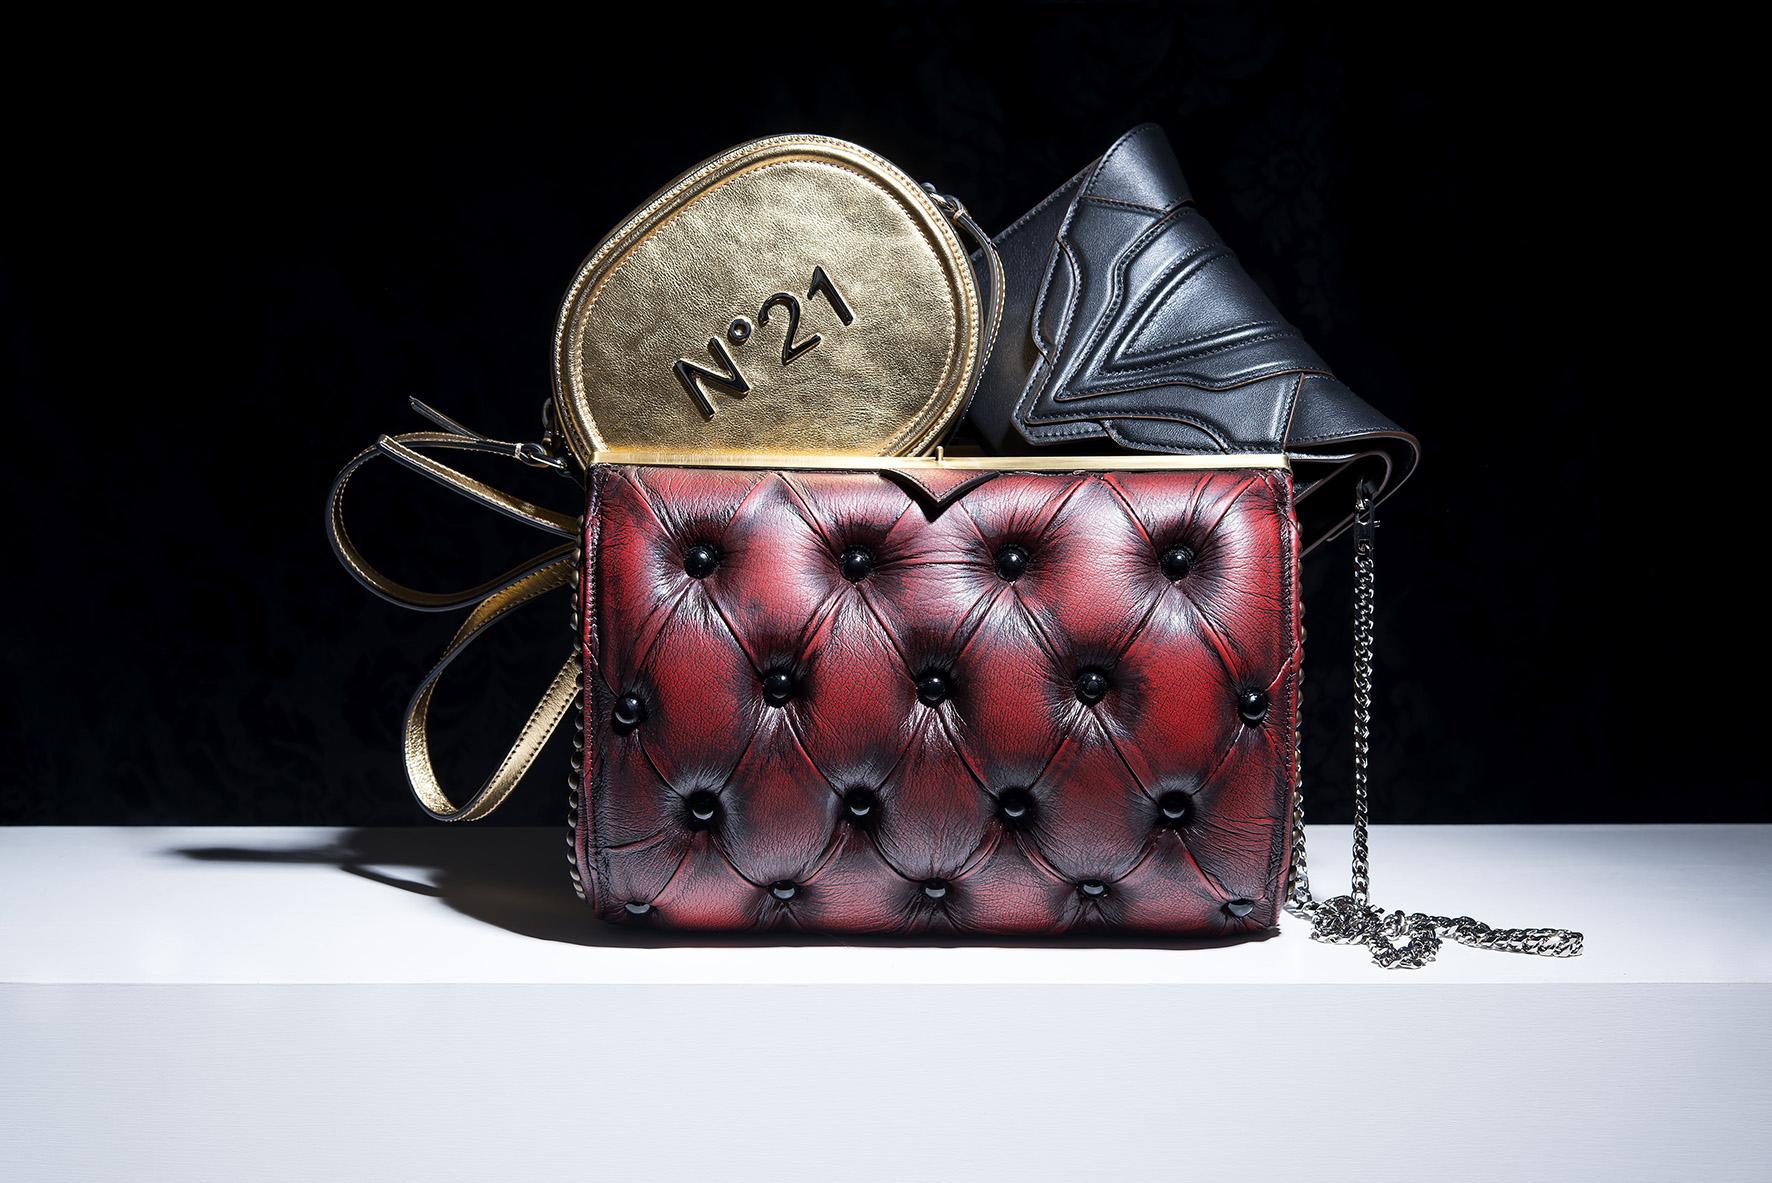 harleq bag red leather